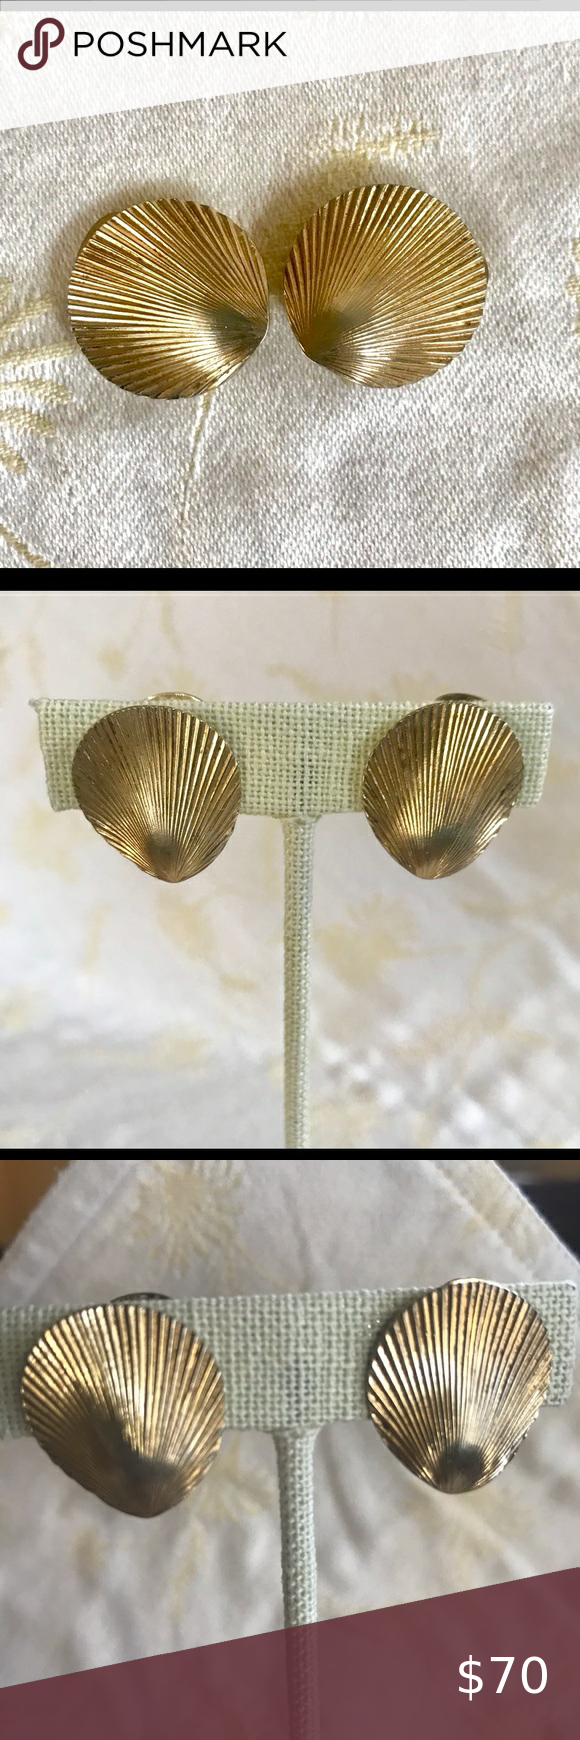 Mid Century Chr Dior Shell Clip Earrings Clip On Earrings Dior Earrings Dior Jewelry